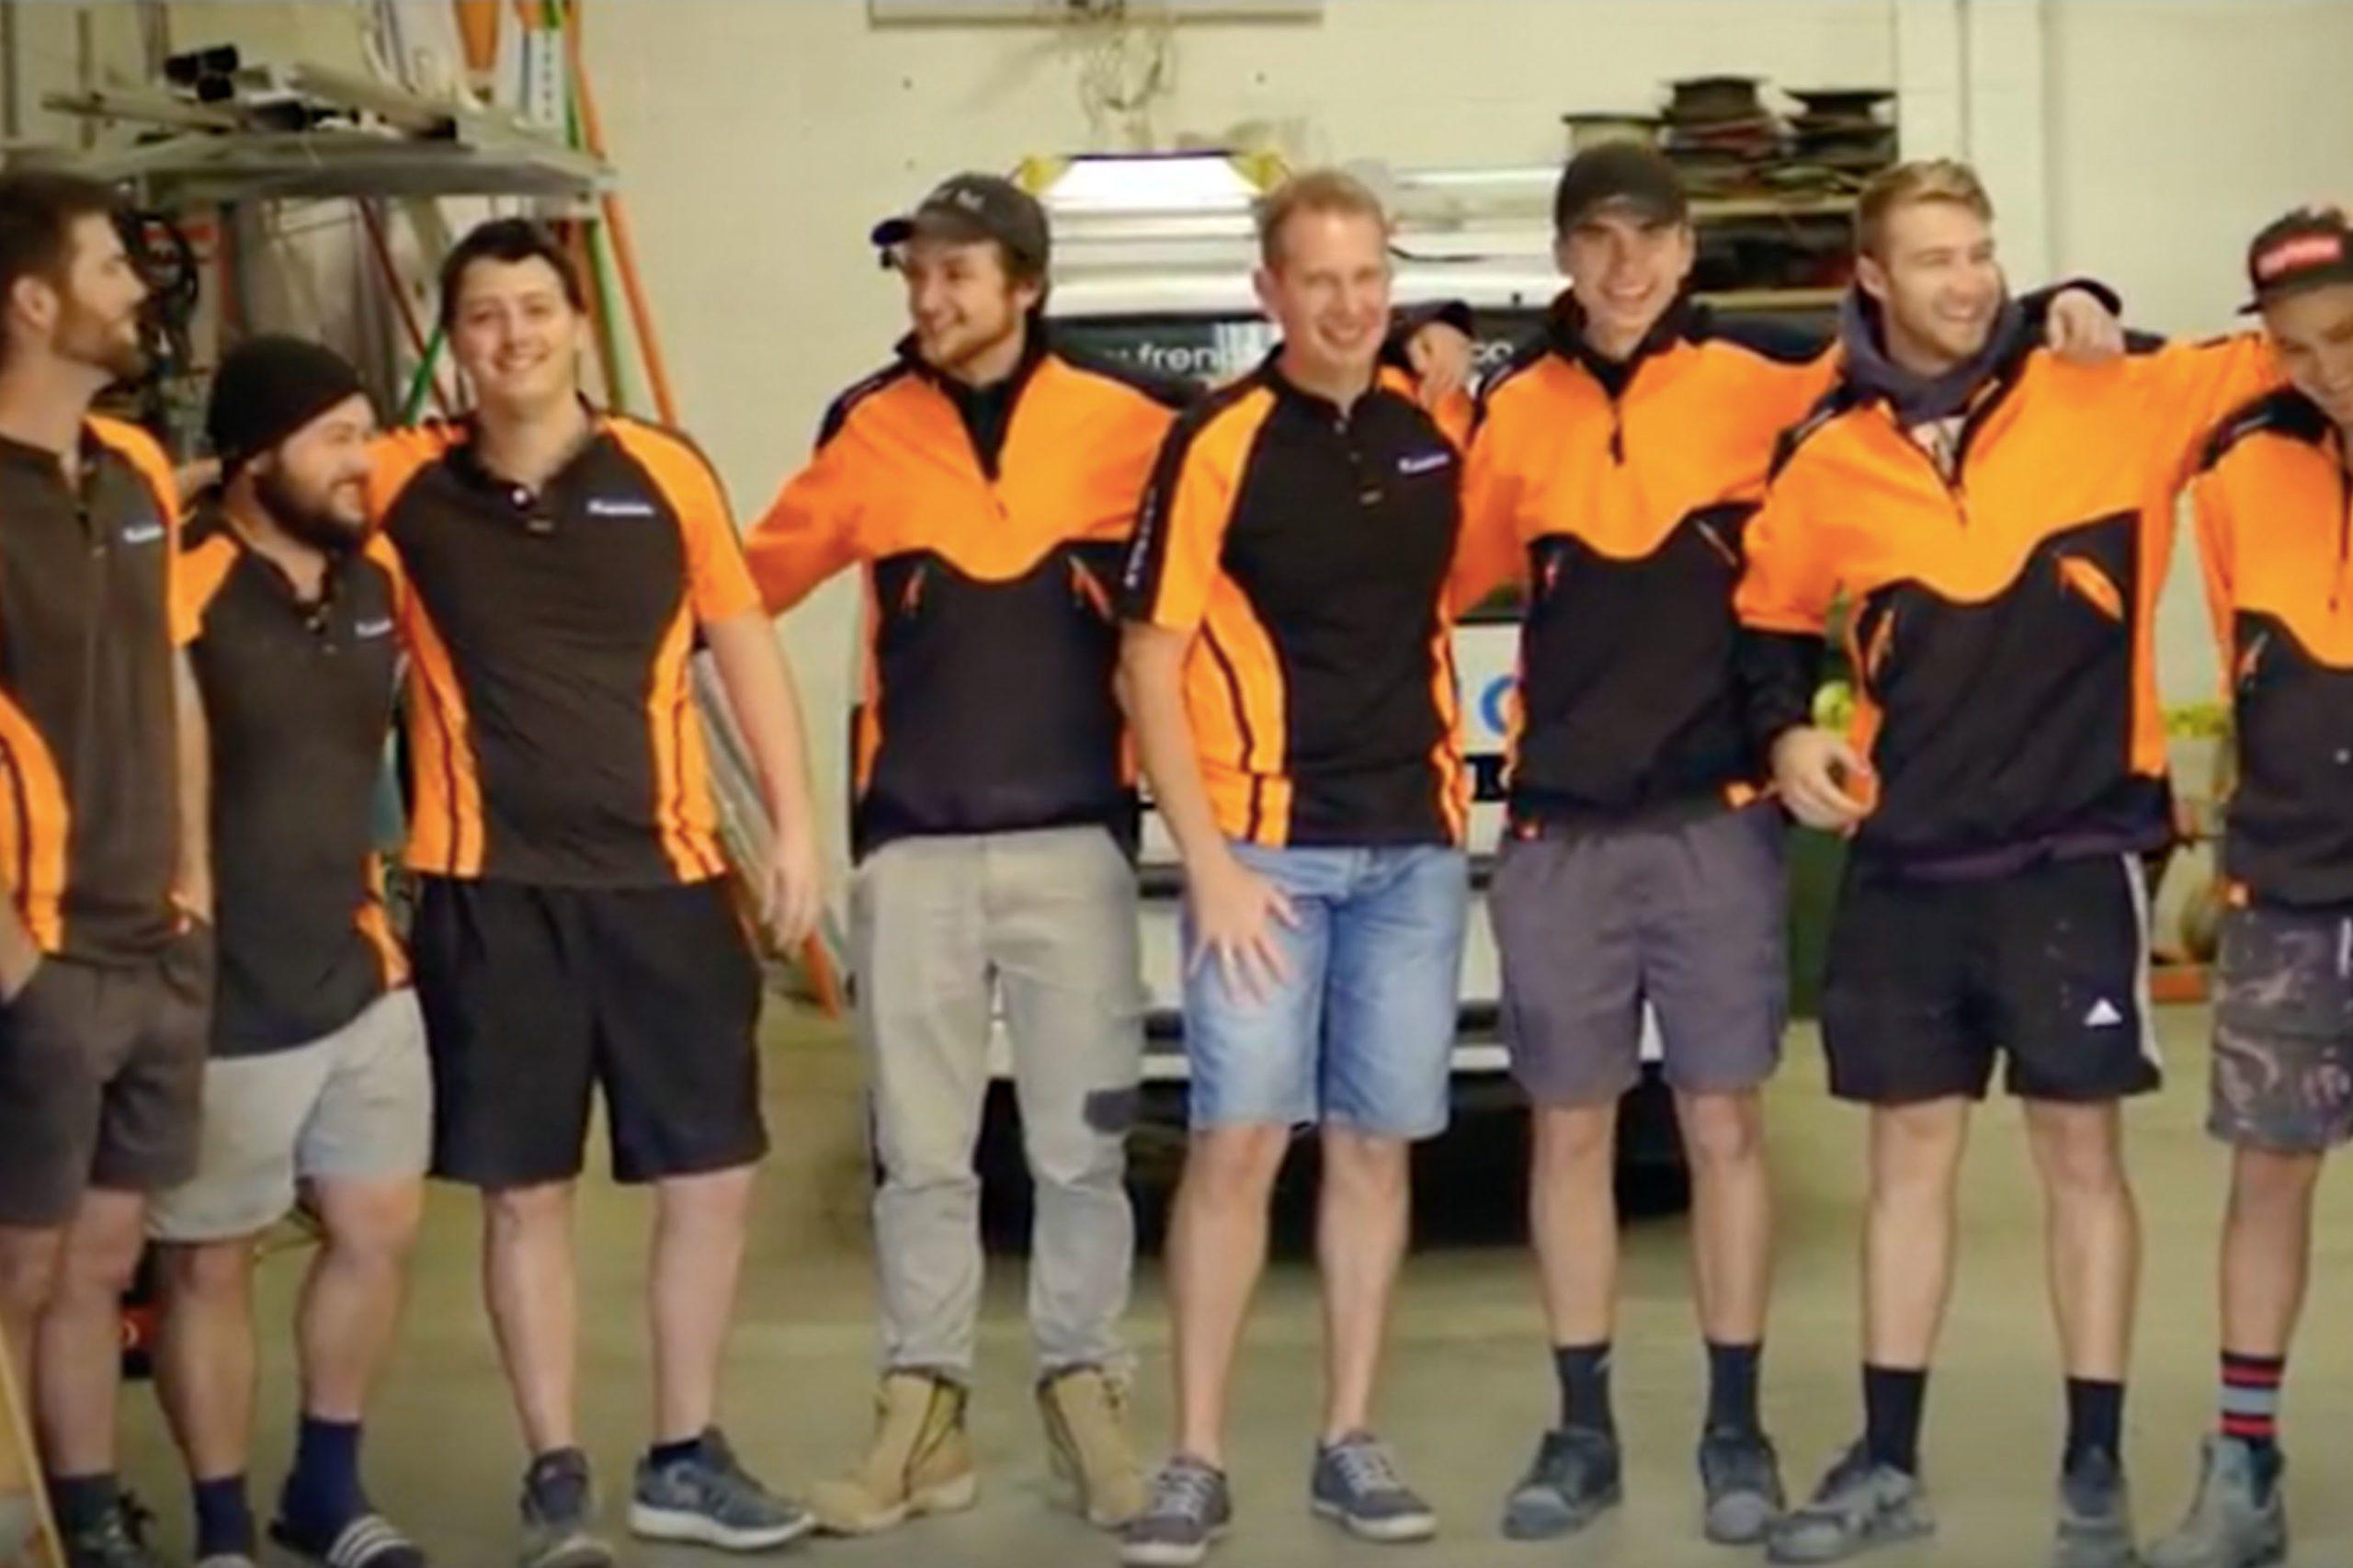 Our apprentices